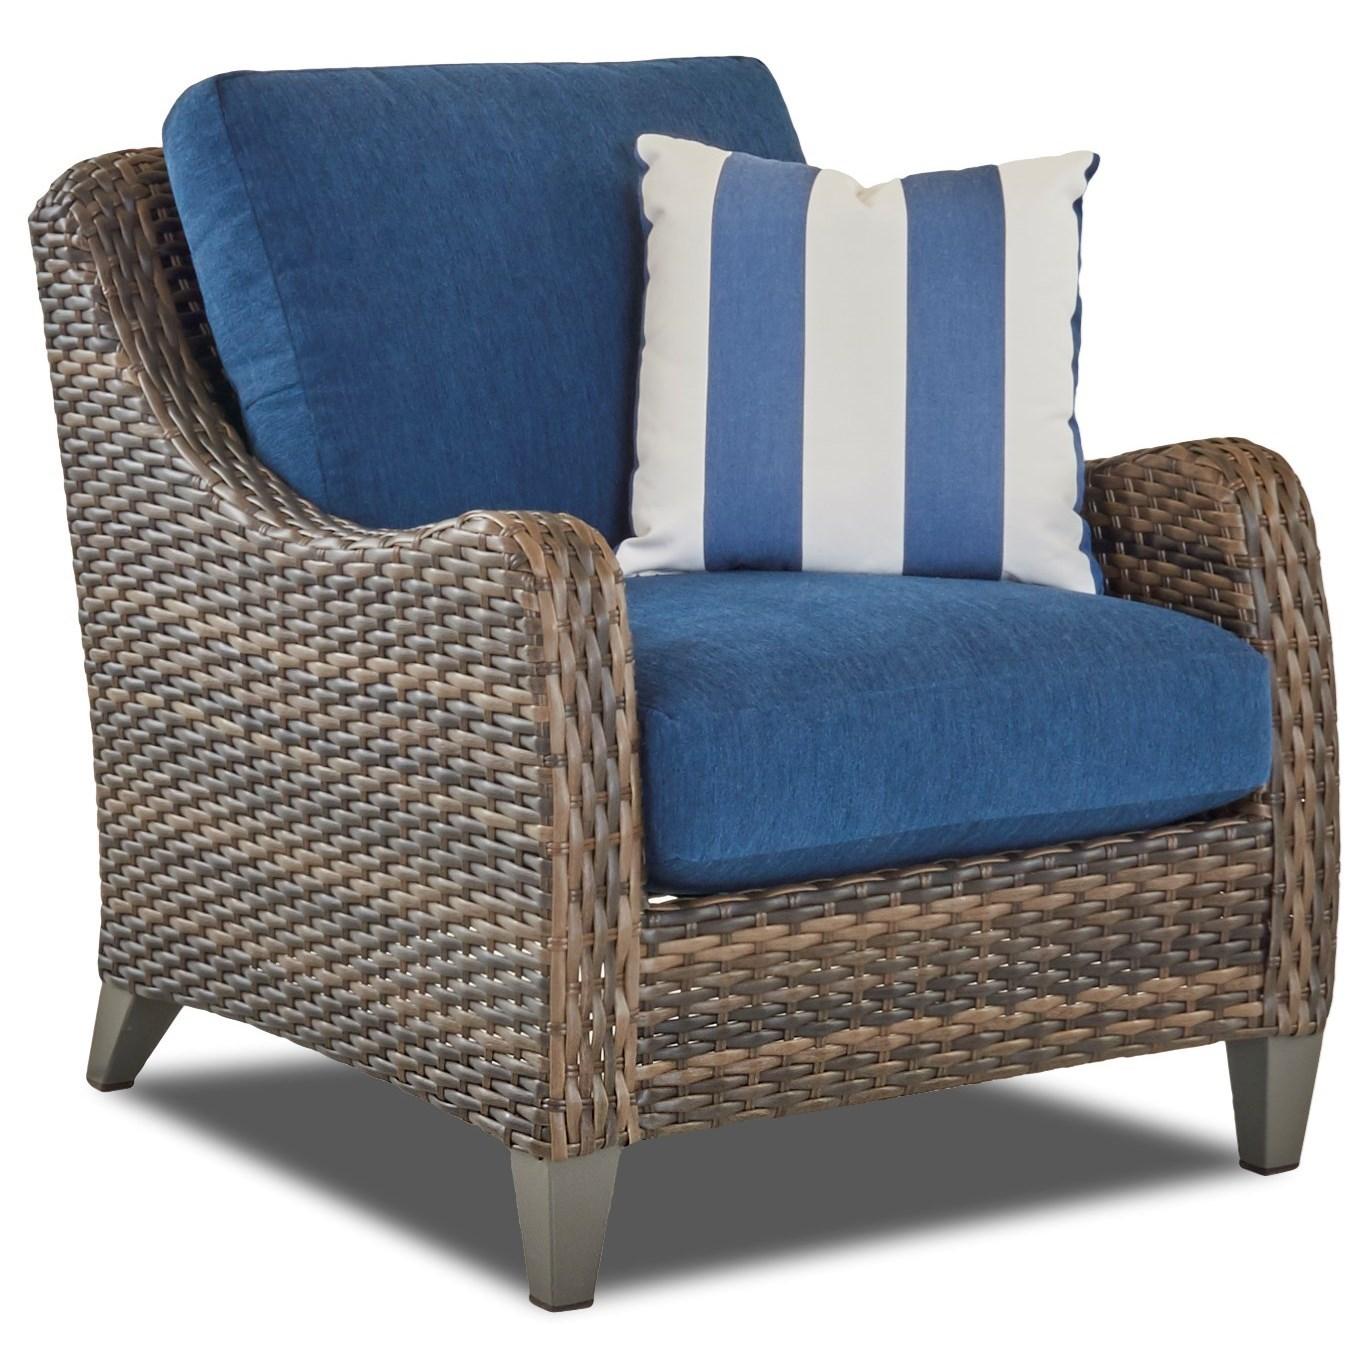 Klaussner Outdoor Mesa W7502 C Outdoor Lounge Chair